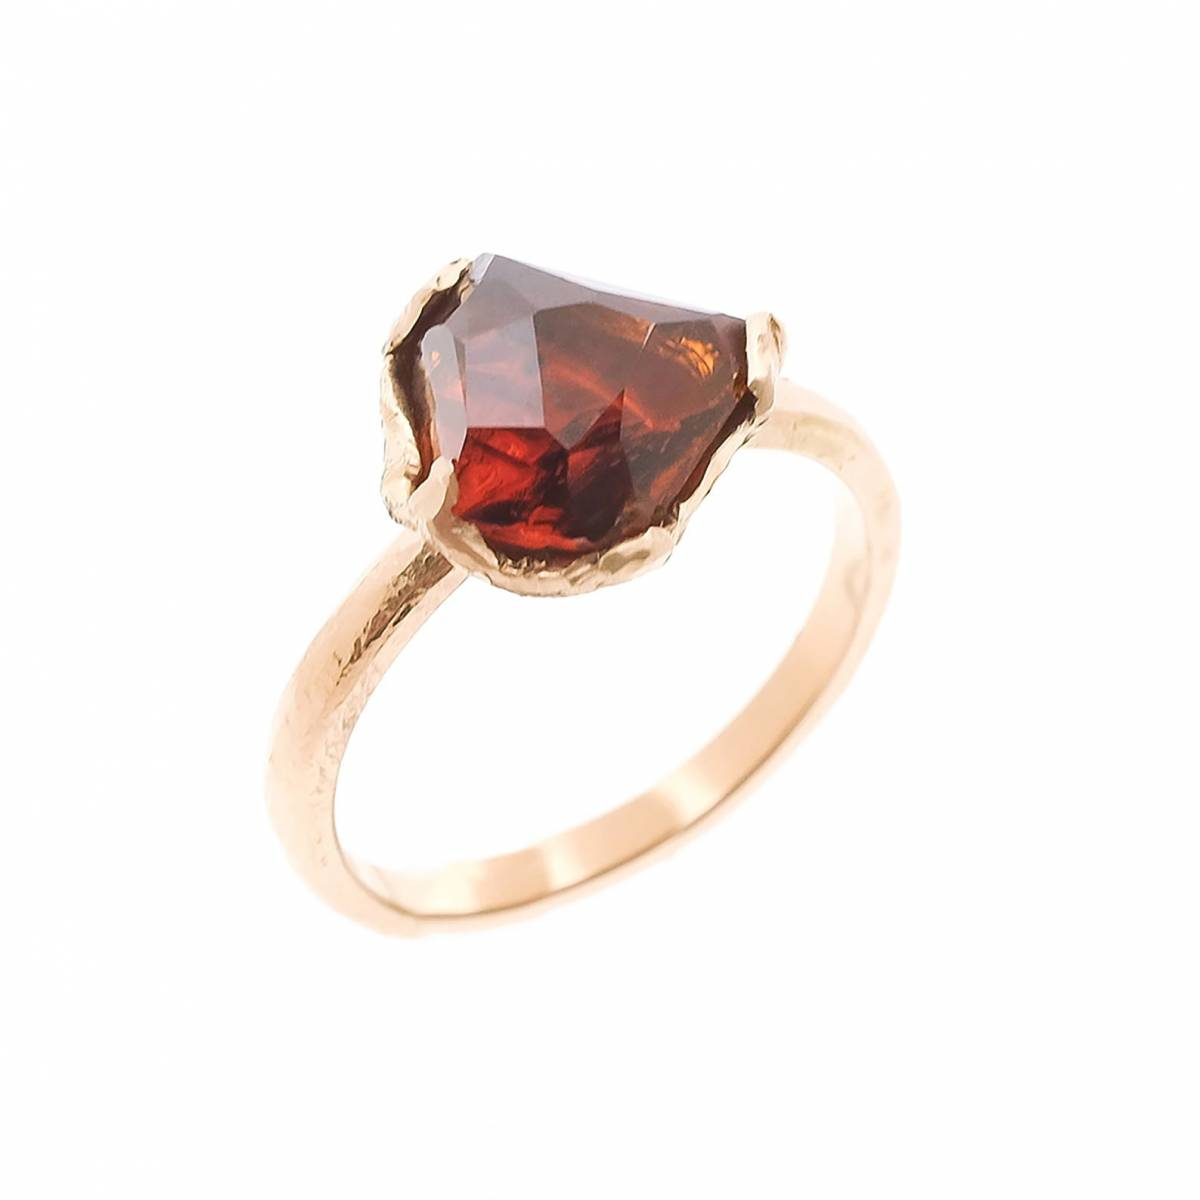 Jonas Maes Jewels - Juwelen - Bruidsjuwelen - Verlovingsring - Trouwring - House of Weddings - 28